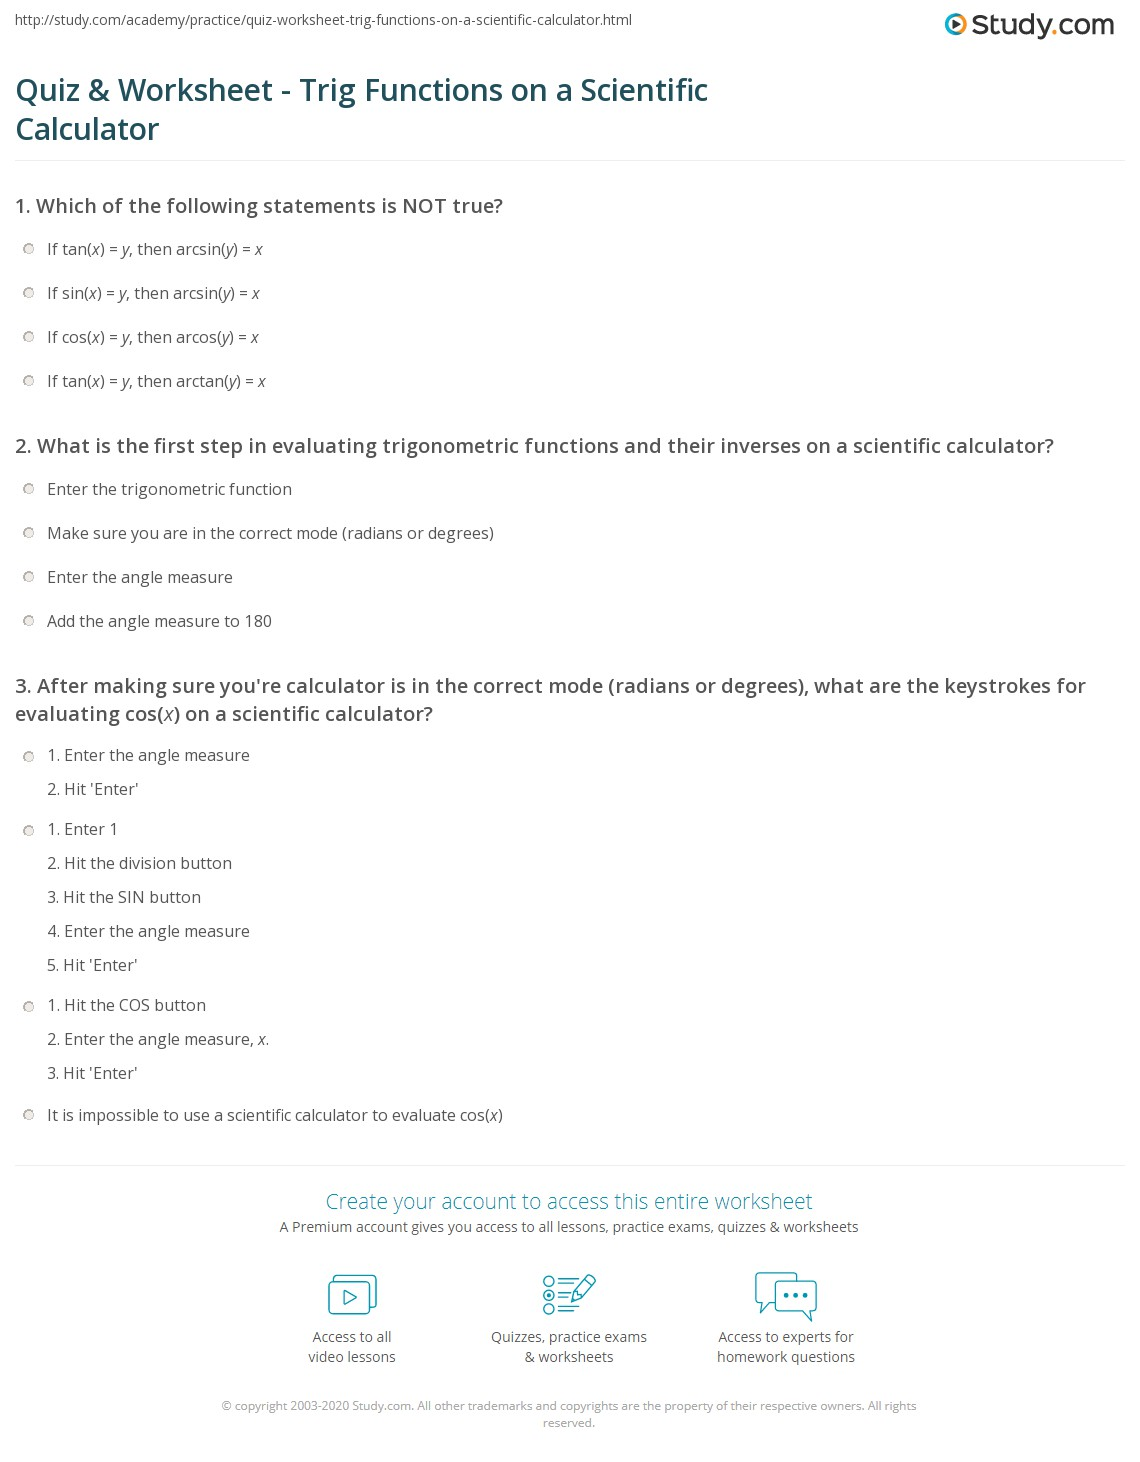 Quiz & Worksheet - Trig Functions on a Scientific Calculator | Study.com